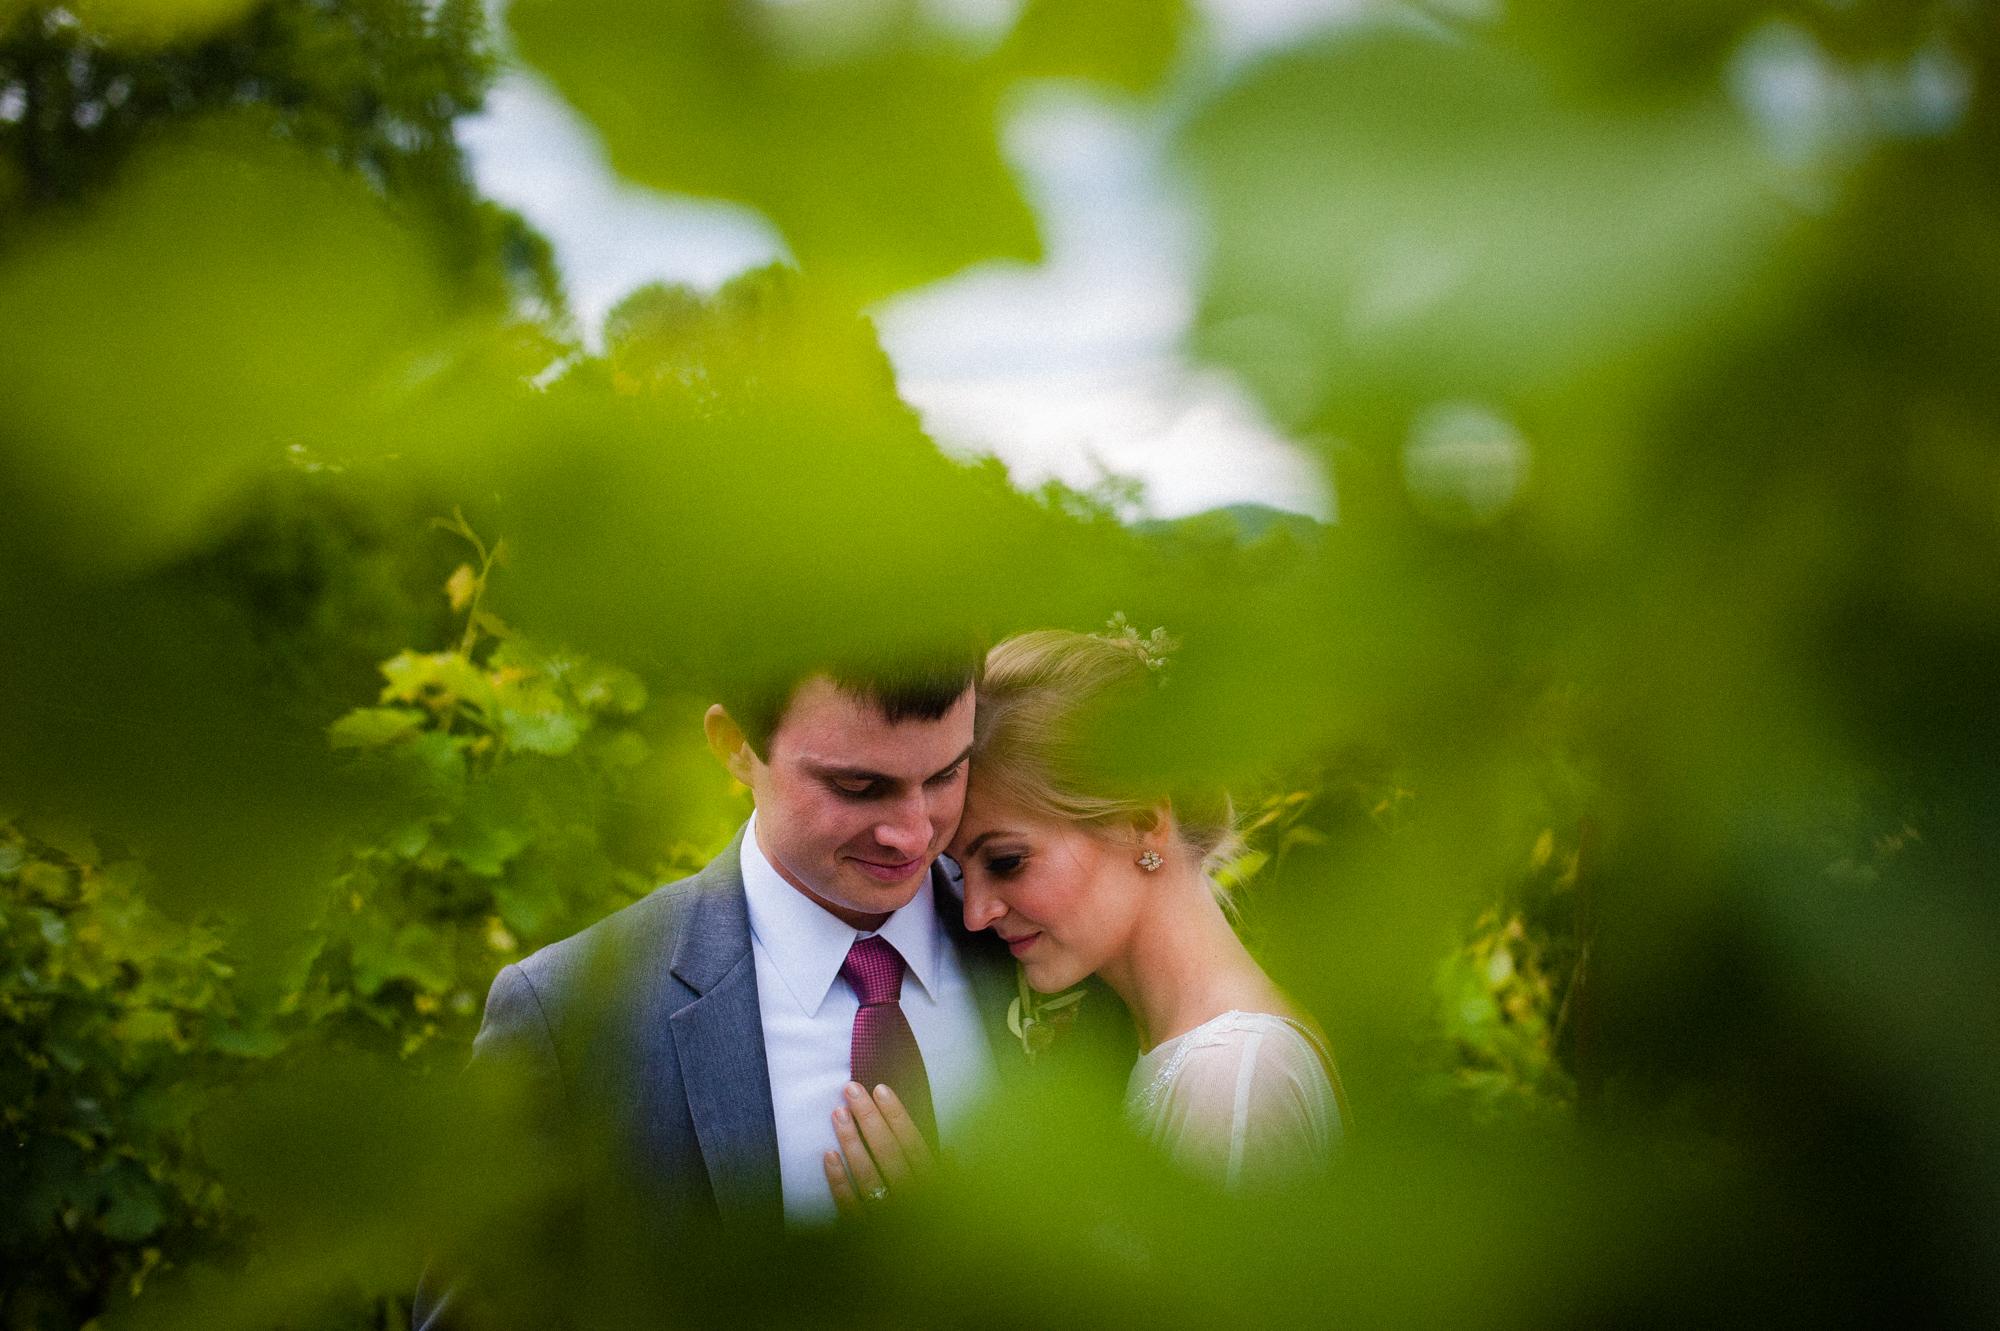 bride and groom in between grapevines during their vineyard wedding